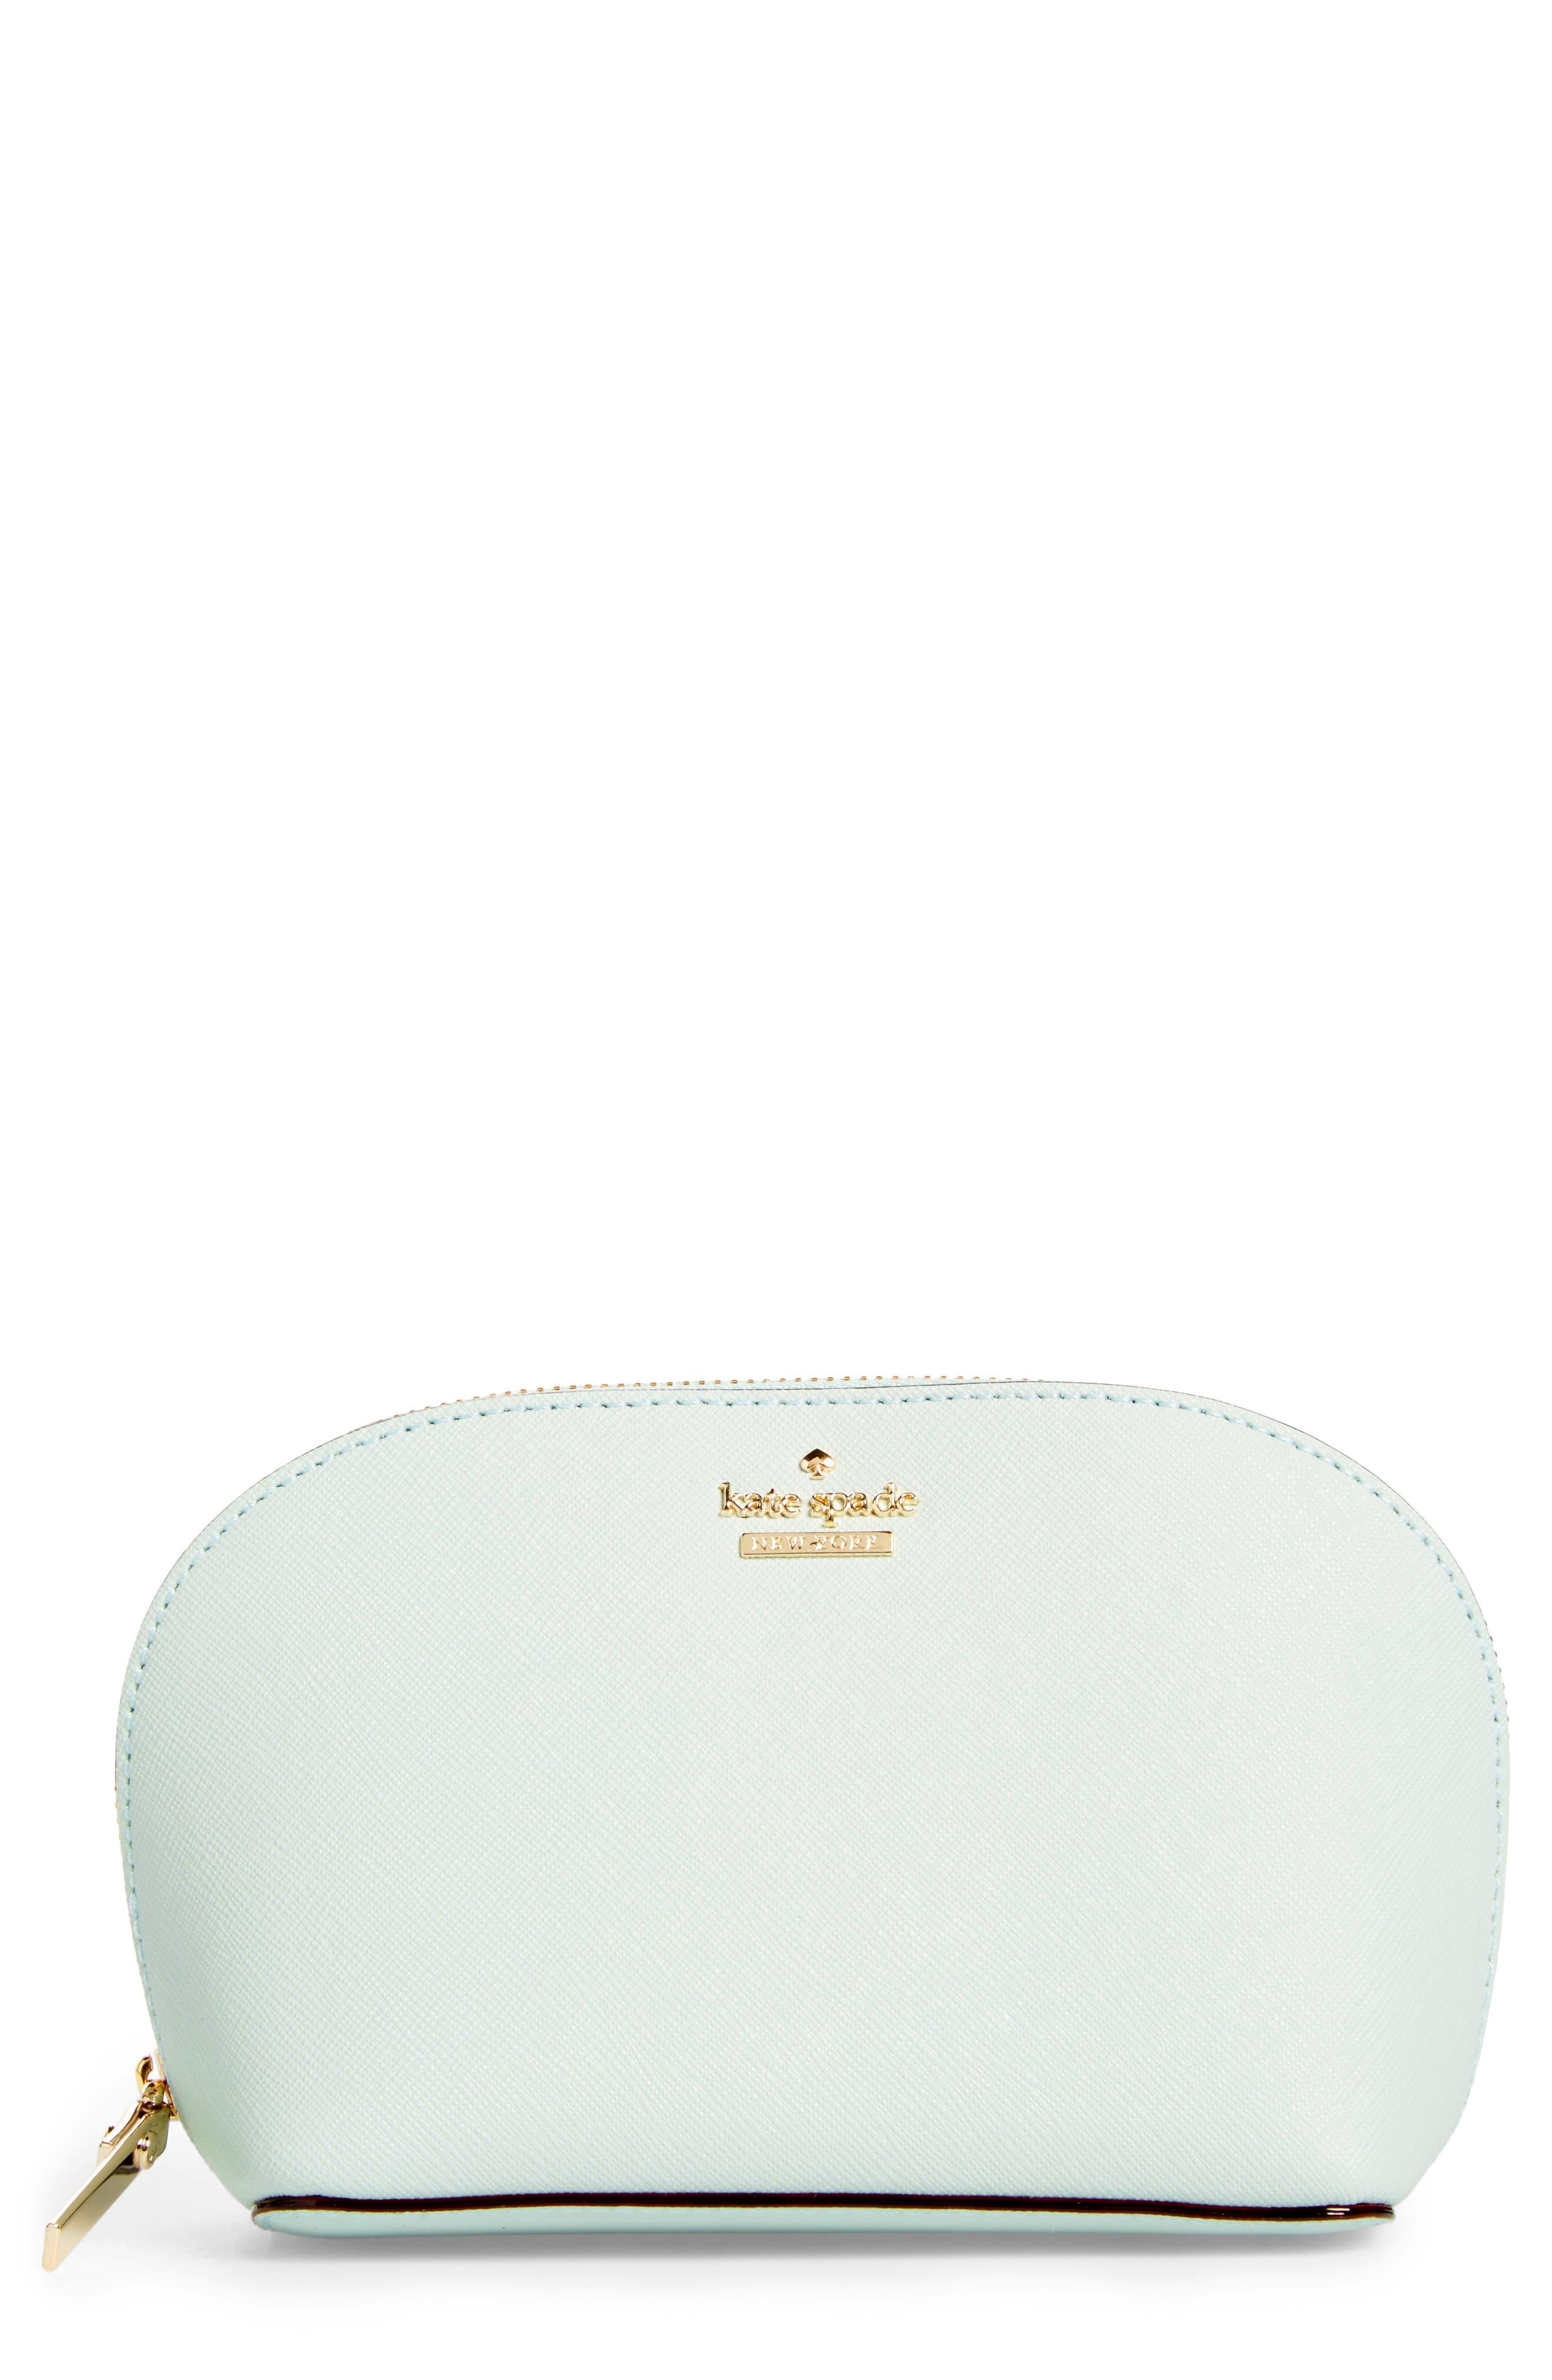 cameron street - small abalene leather cosmetics bag,                             Main thumbnail 1, color,                             302